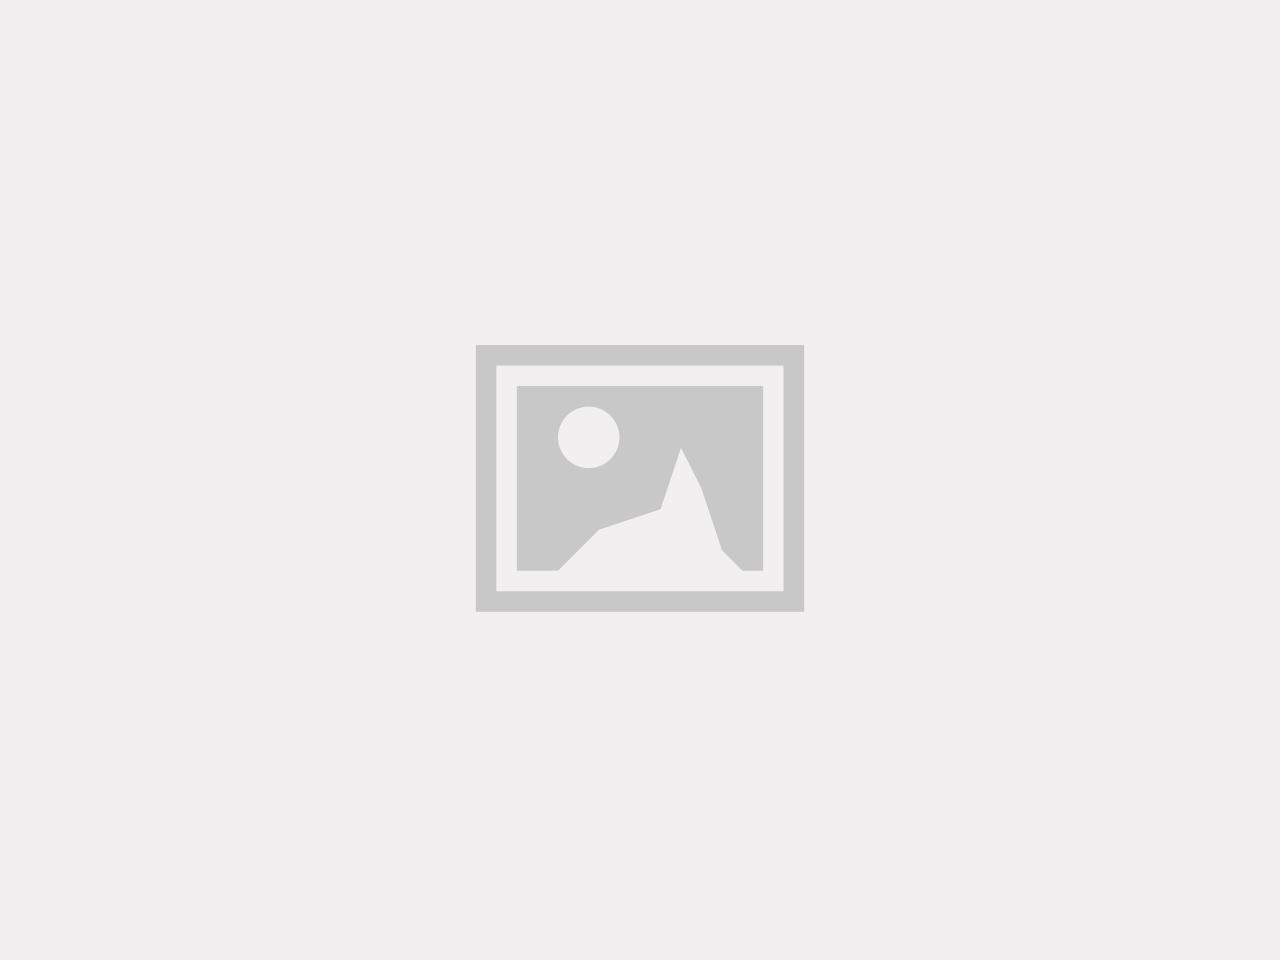 Solpanelspaket Sunwind Basic 200 W SOLCELLSPAKET 200W 202670